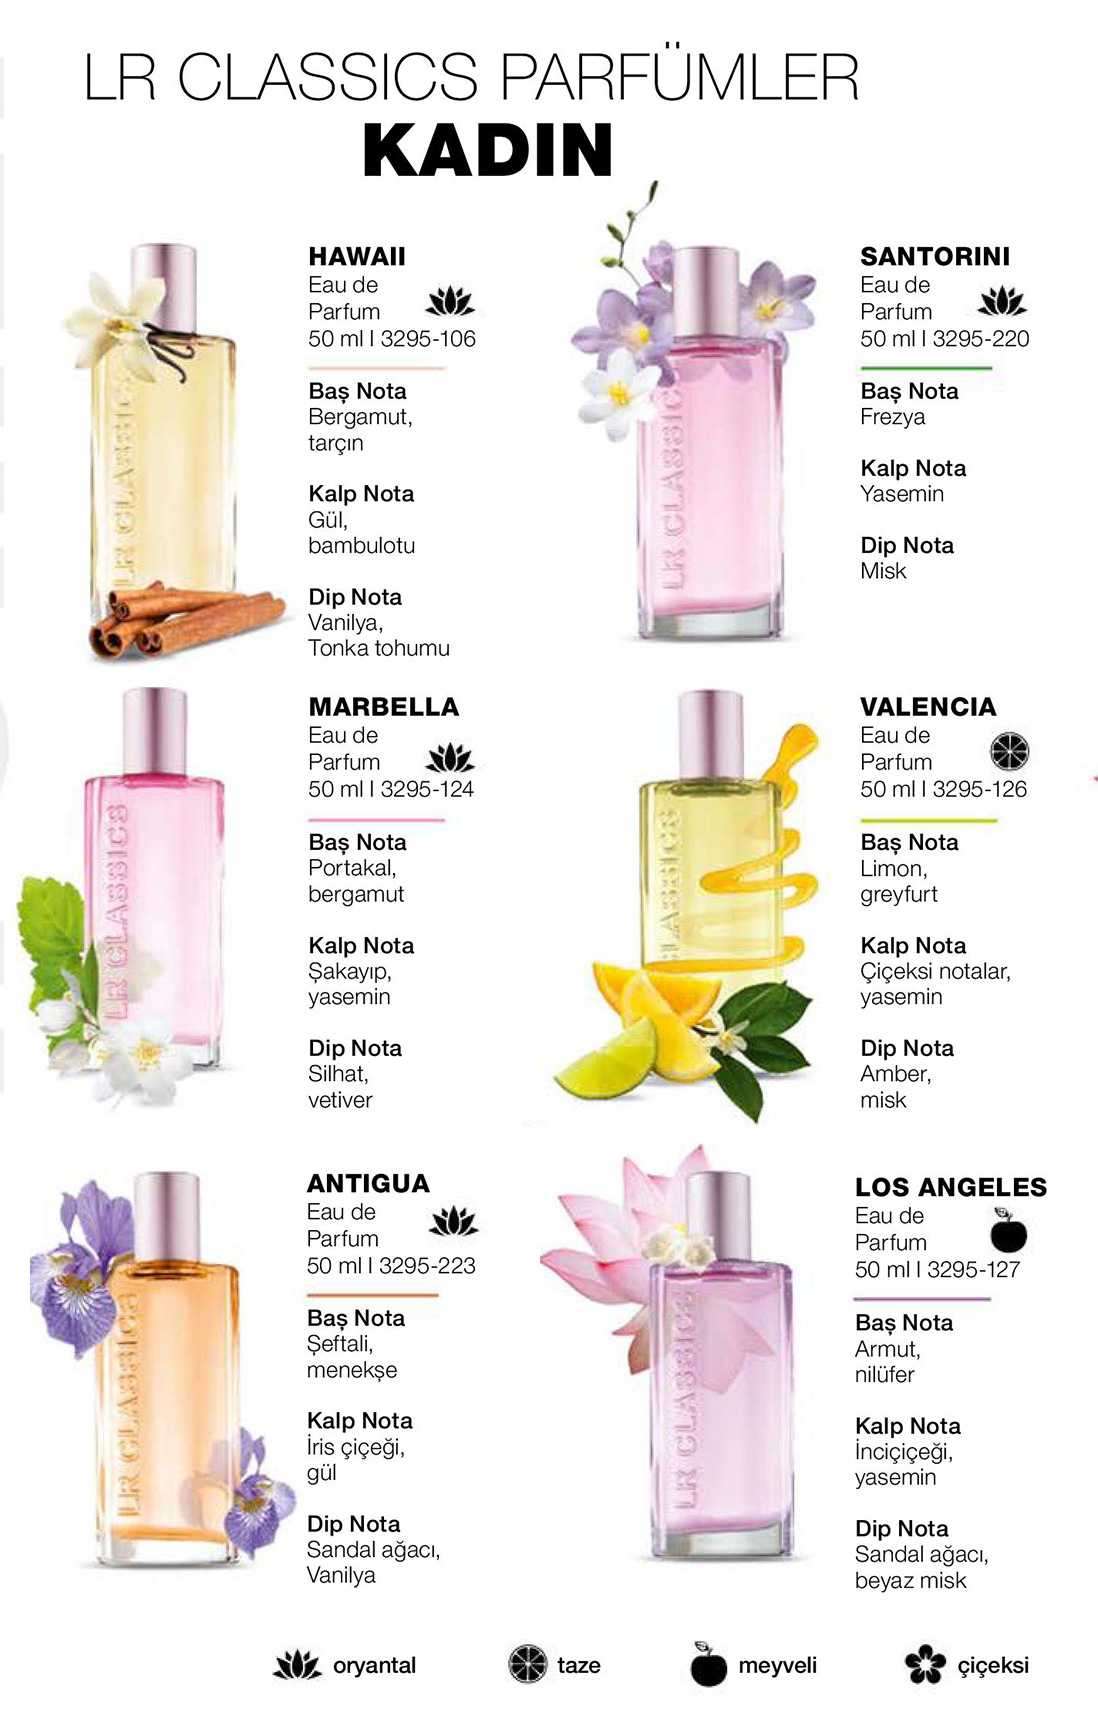 lr classics kadin parfumler katalog